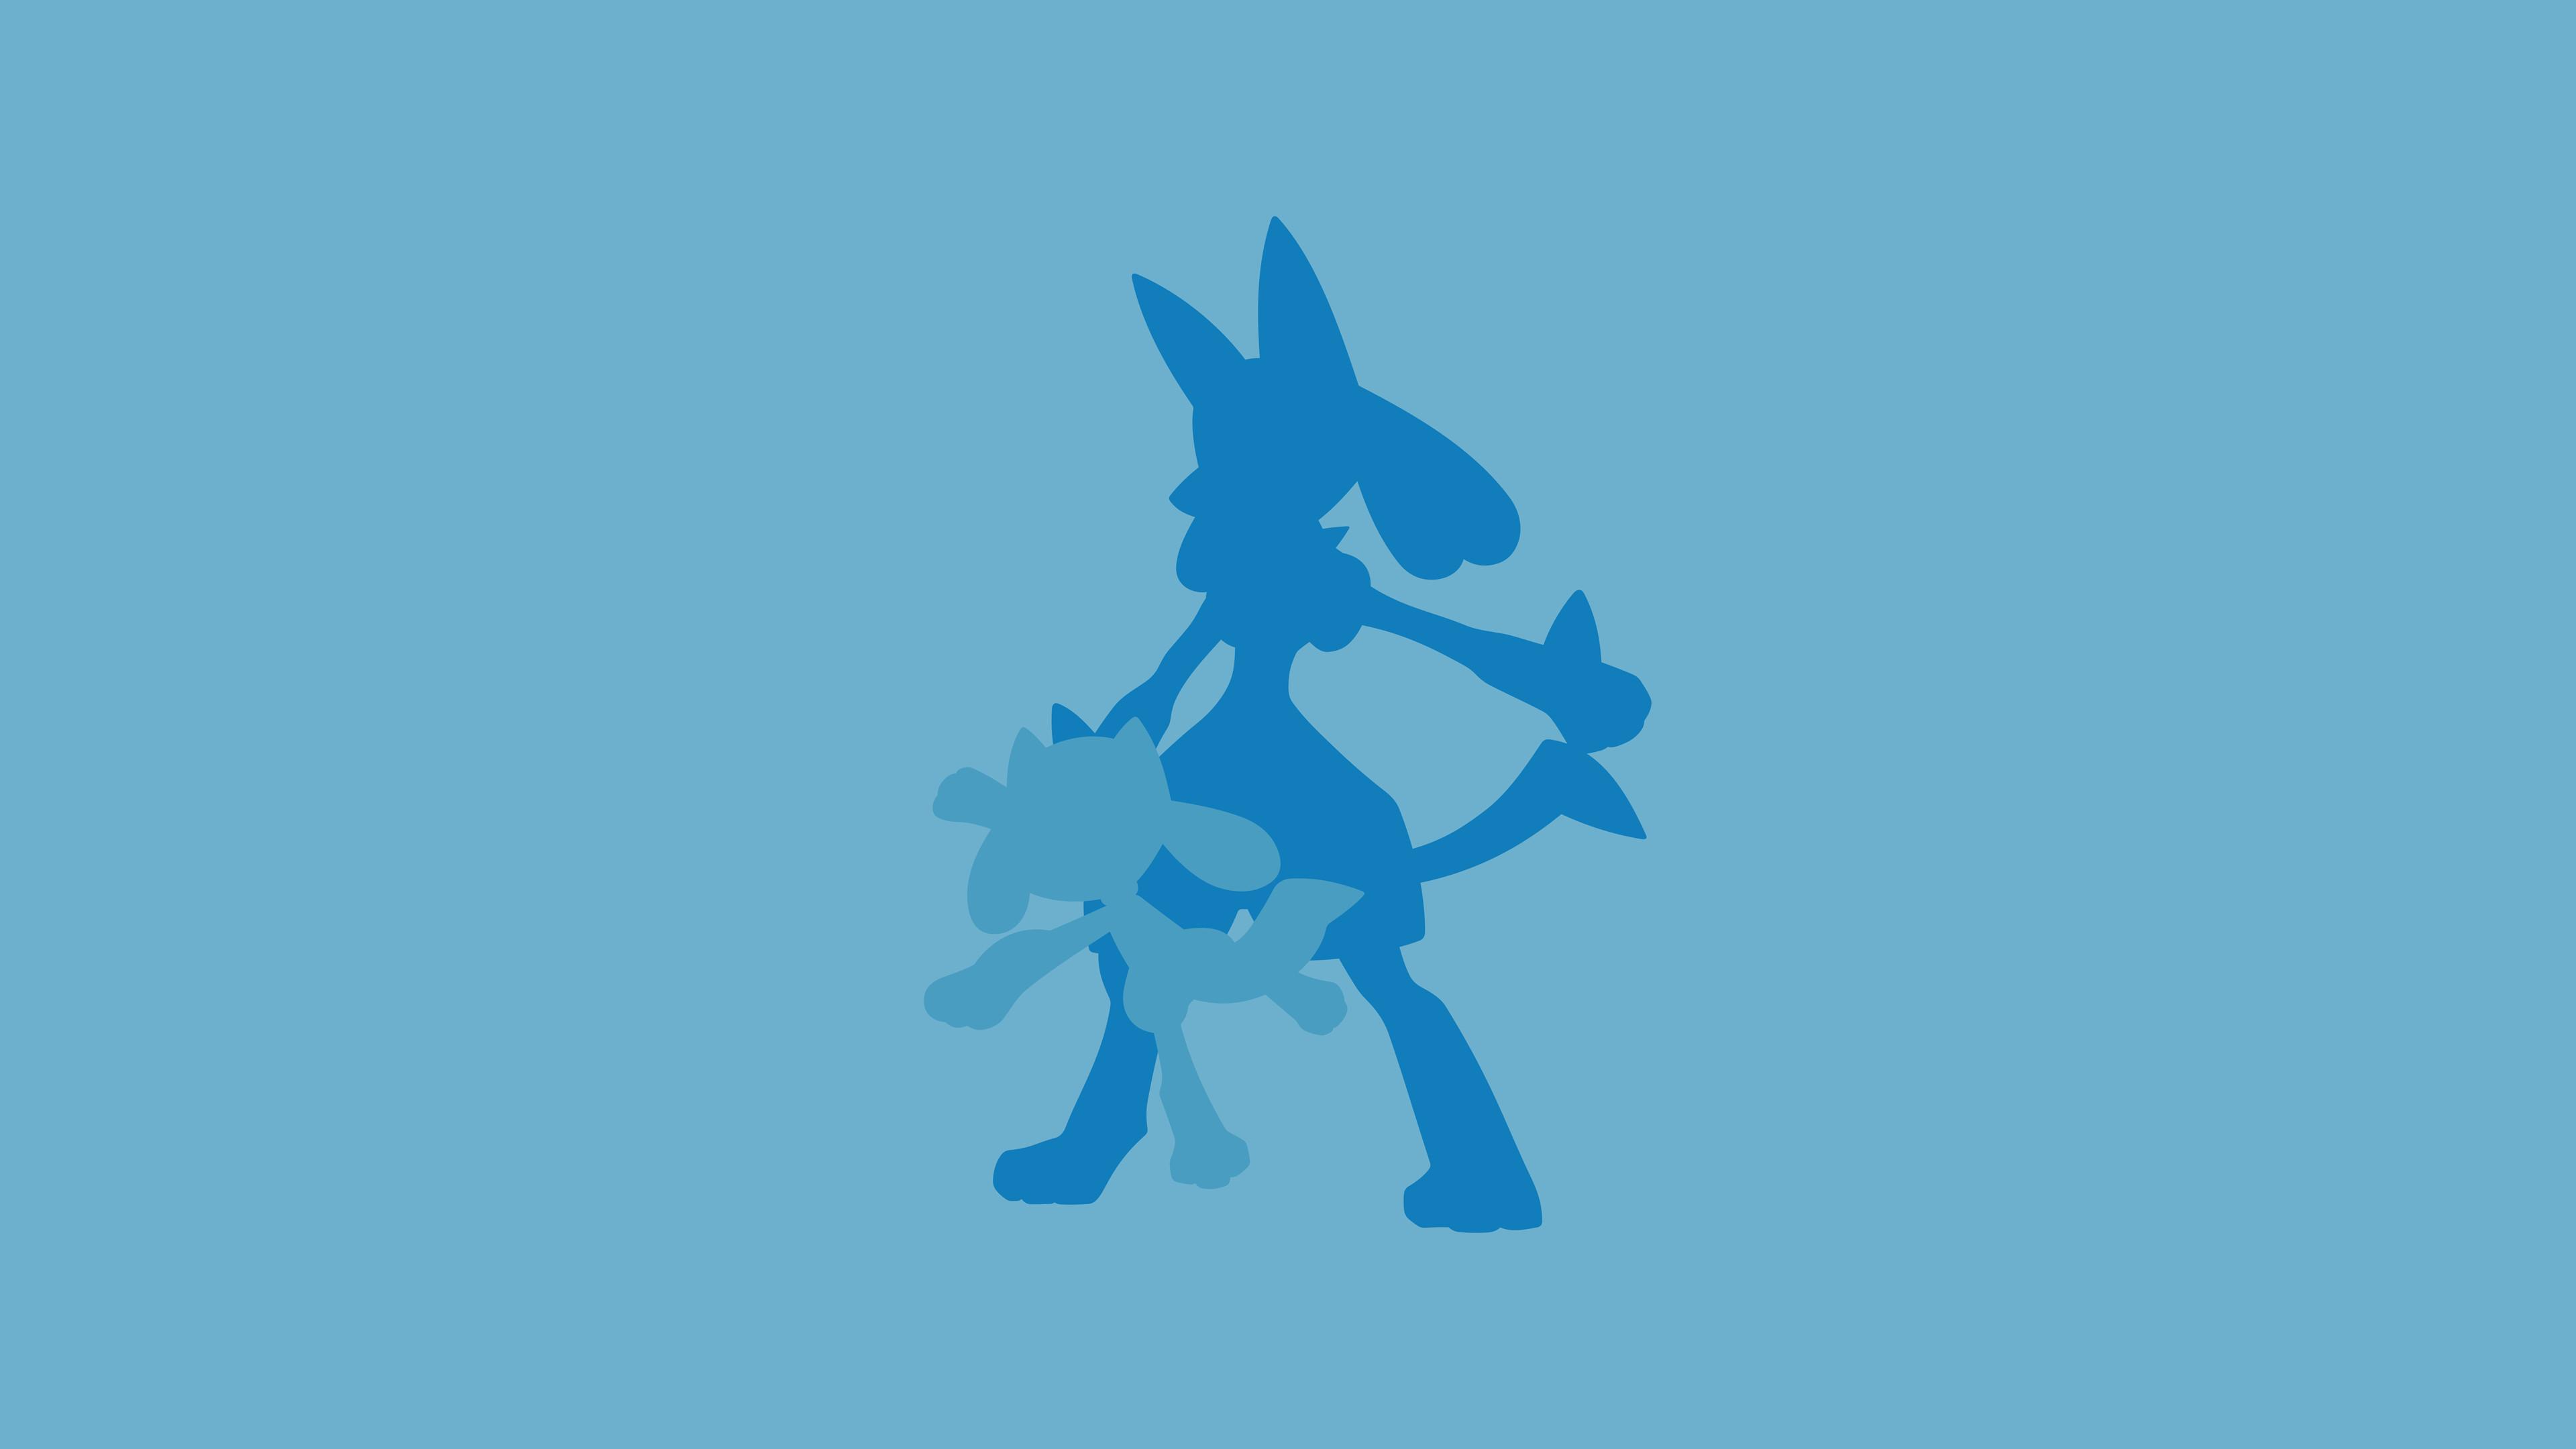 Res: 3840x2160,  Riolu (Pokémon), Lucario (Pokémon) wallpaper and background PNG